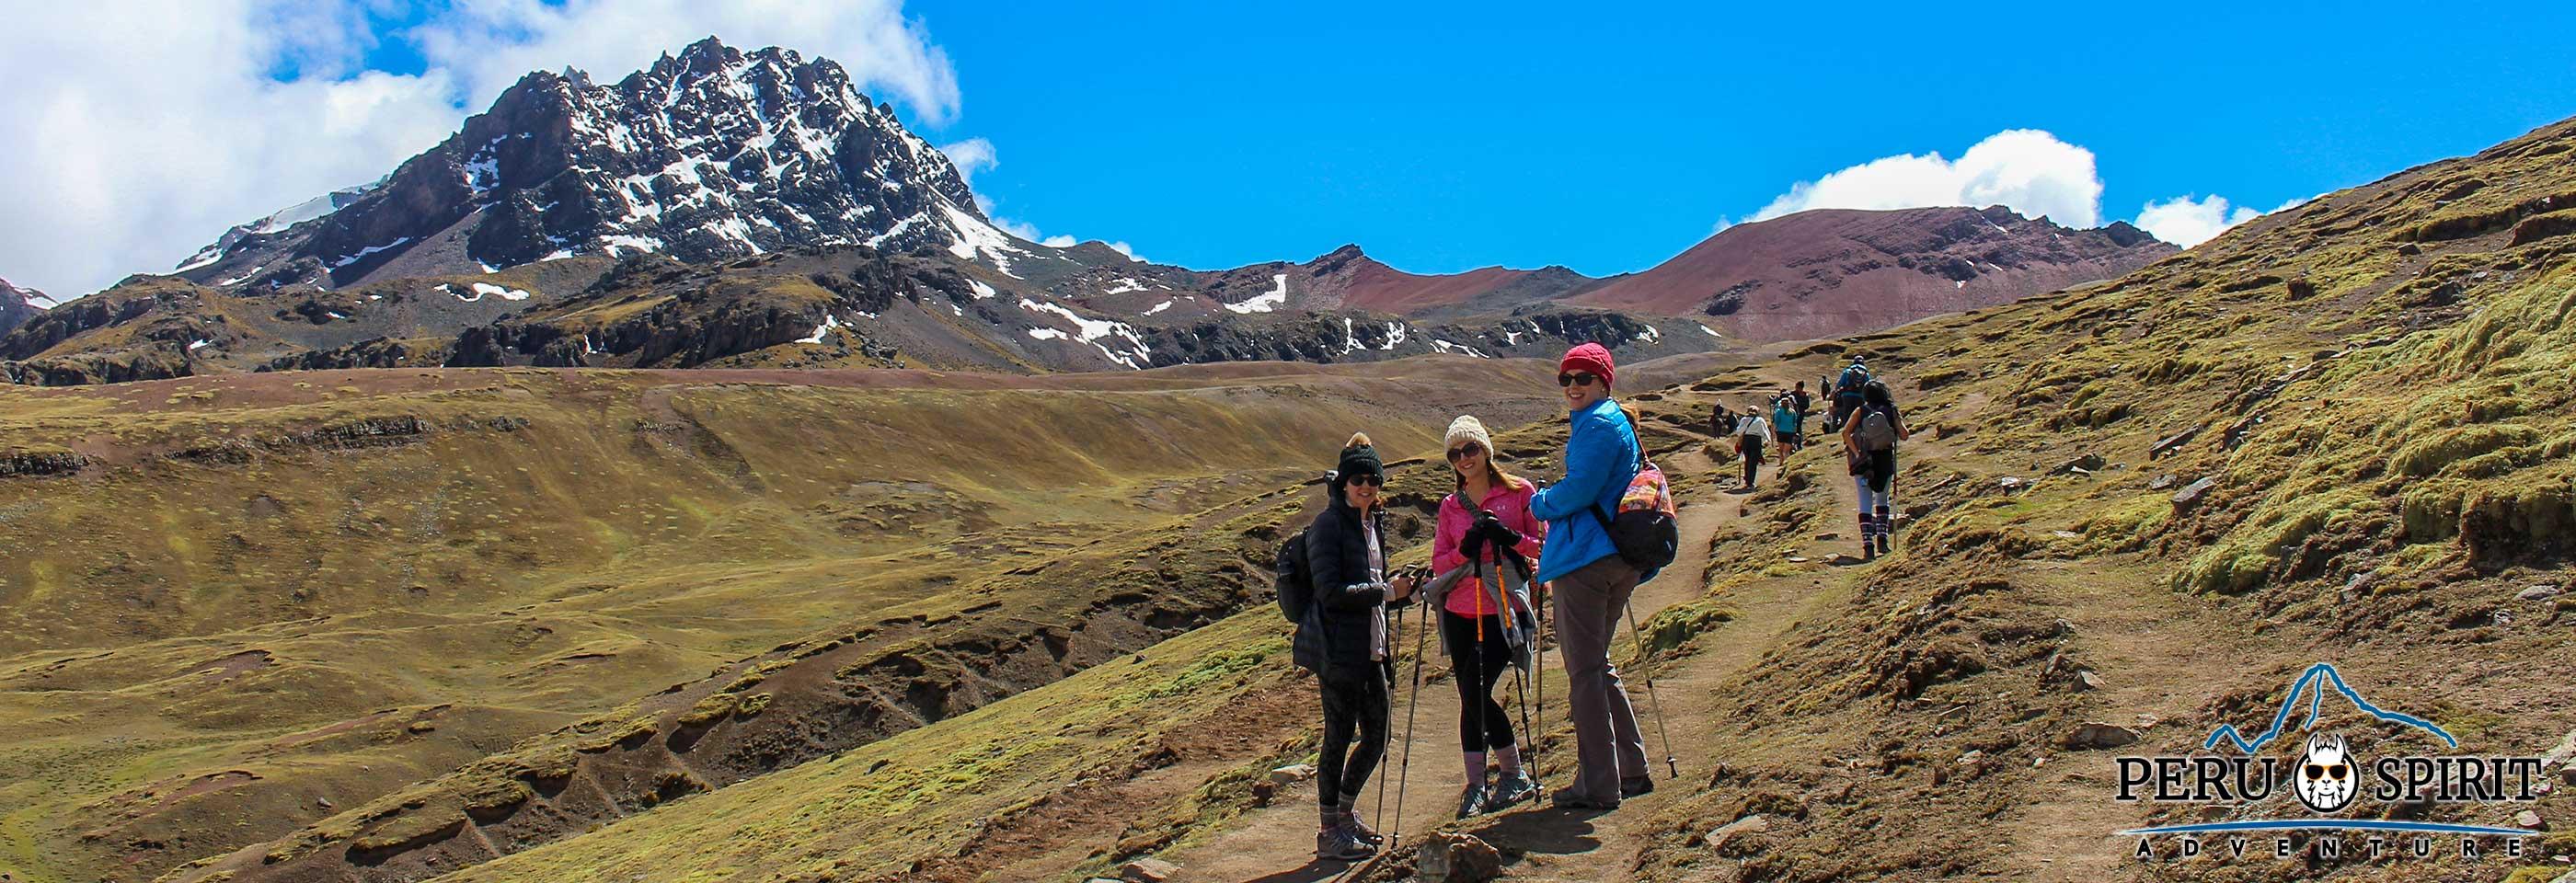 Rainbow Mountain Trek via Ausangate trail